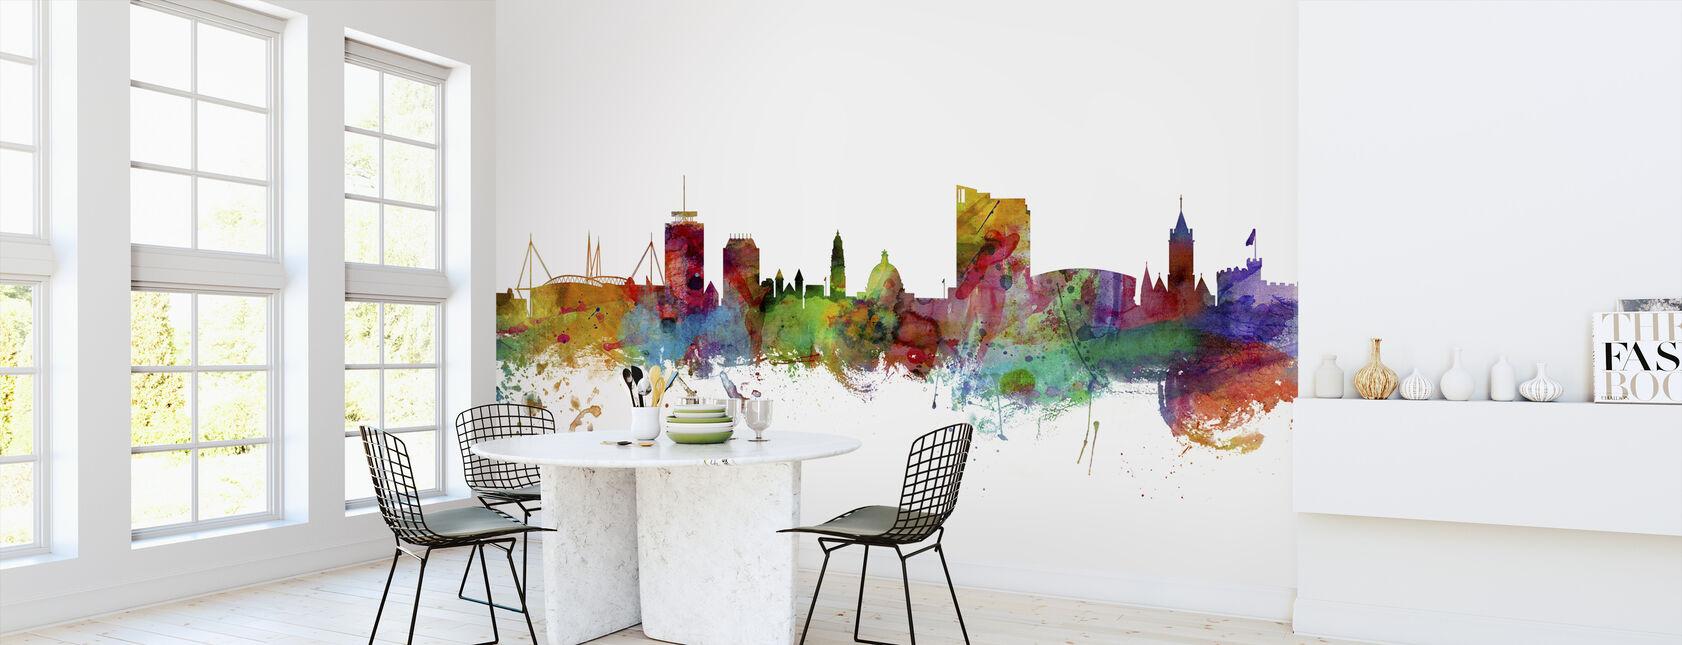 Cardiff Wales Skyline - Wallpaper - Kitchen